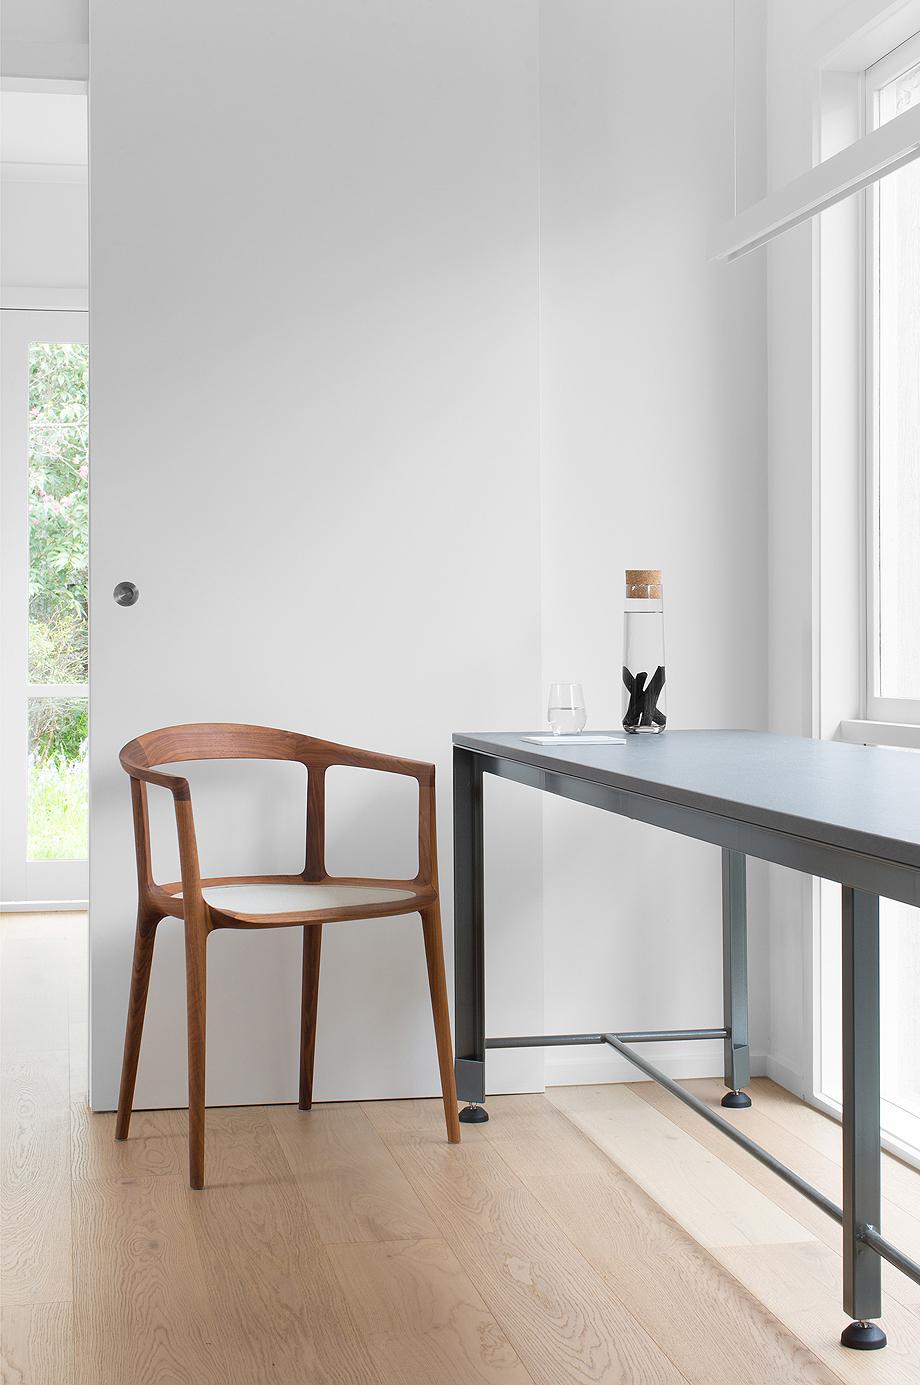 corhampton rd residence de sonelo design studio (7)